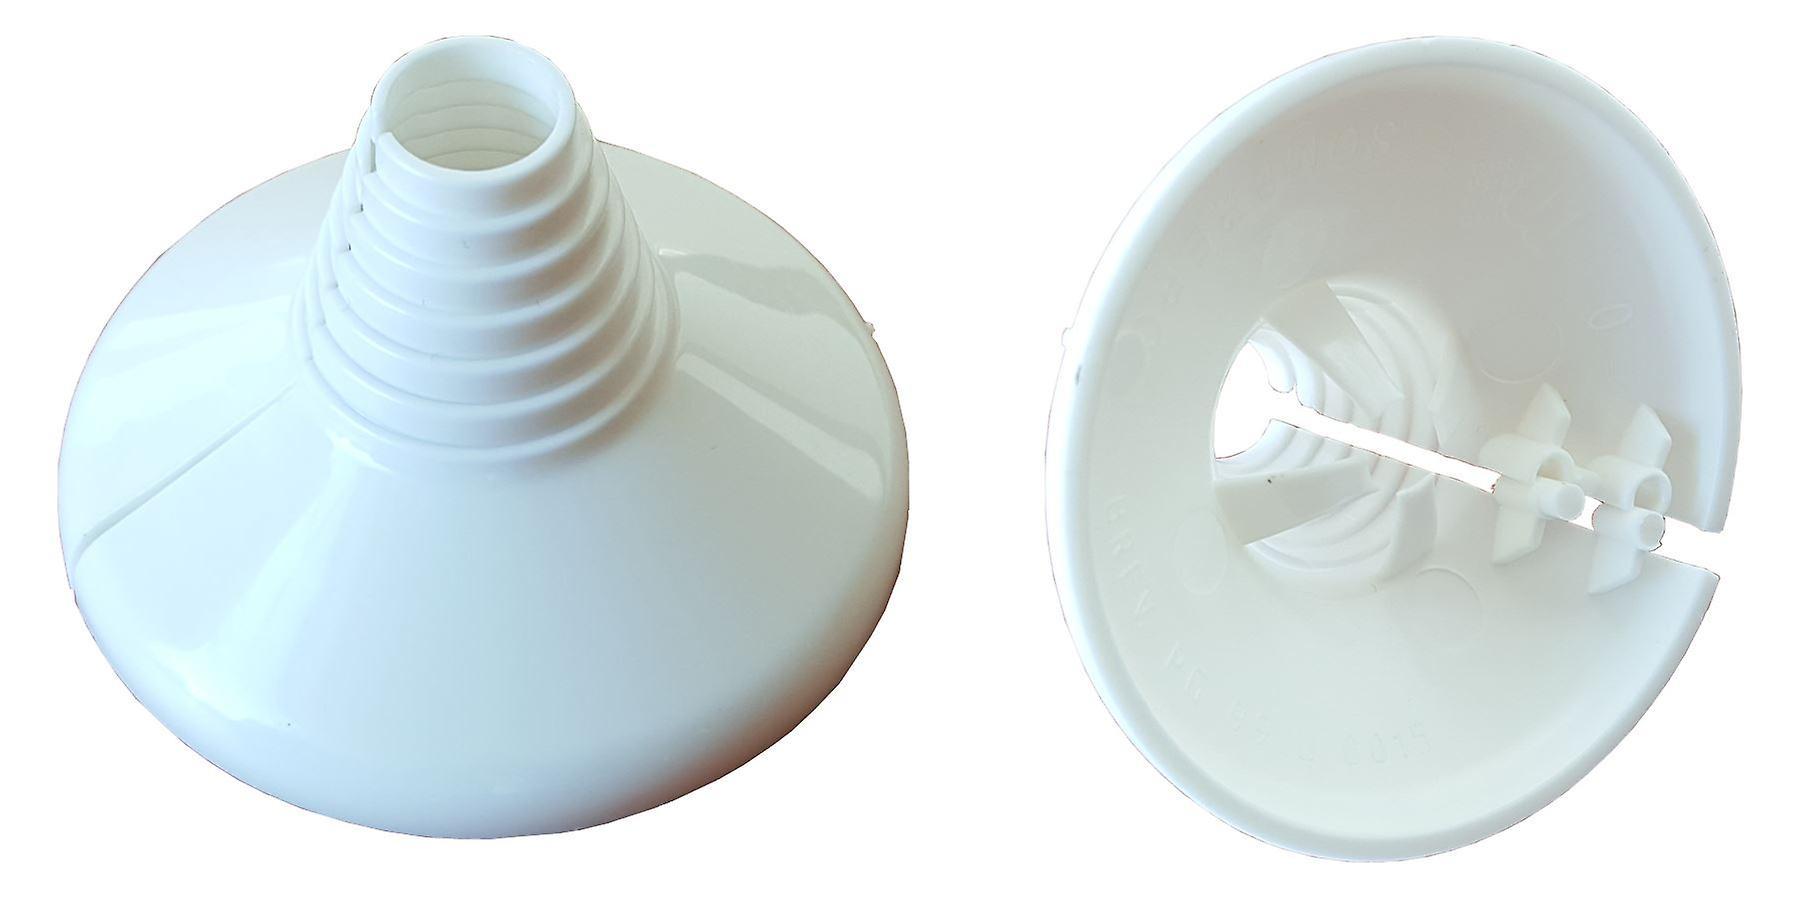 2x White Collar Water Pipe Plastic Cover Rose Rosette 10-22mm Universal Diameter